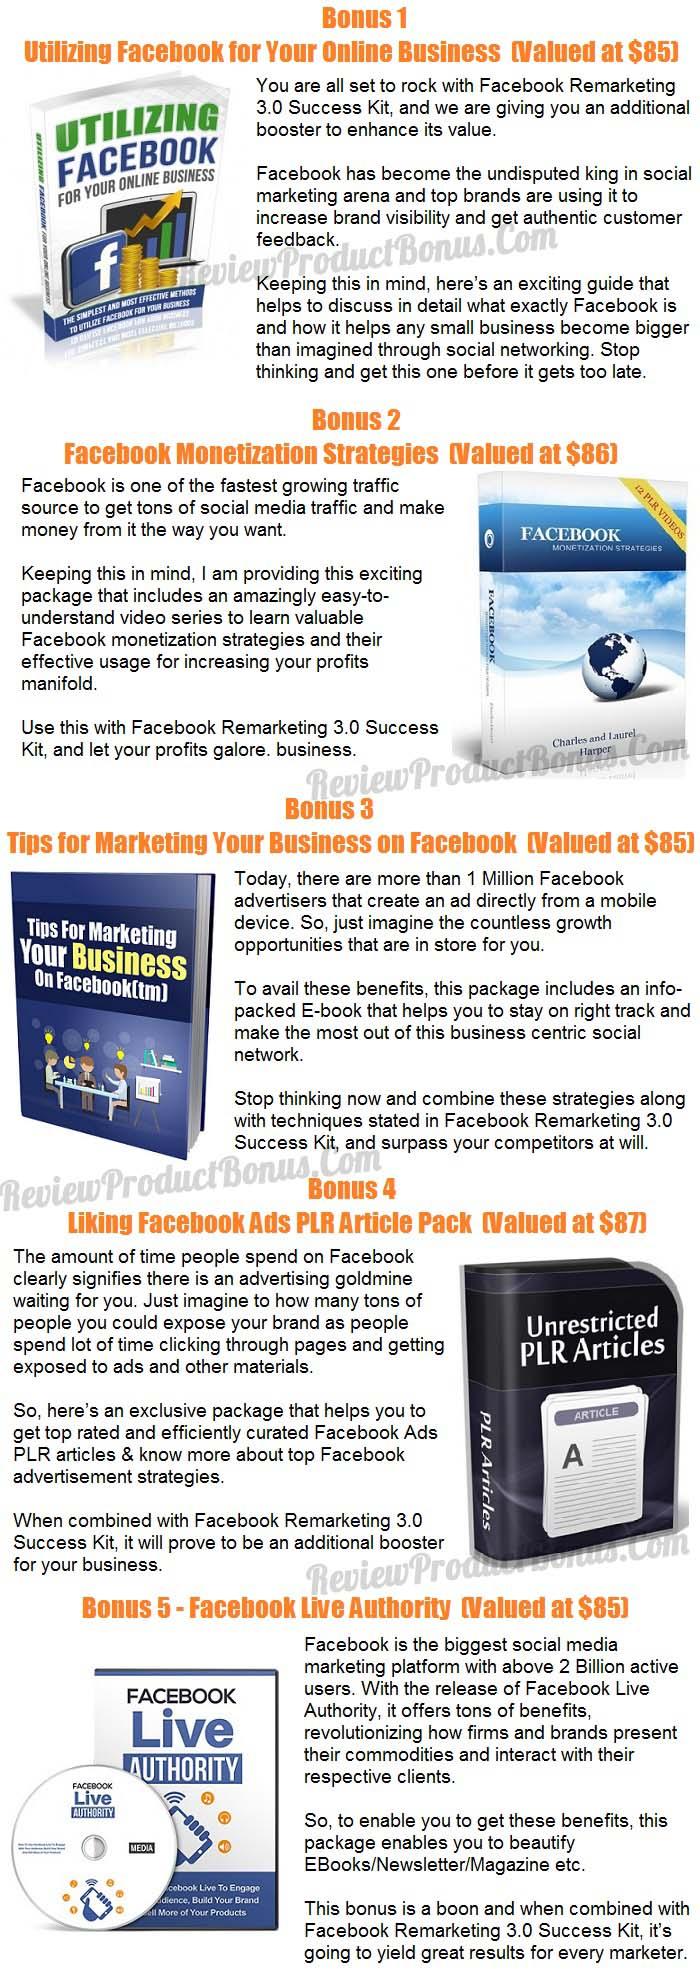 Facebook Remarketing 3.0 Success Kit Bonus